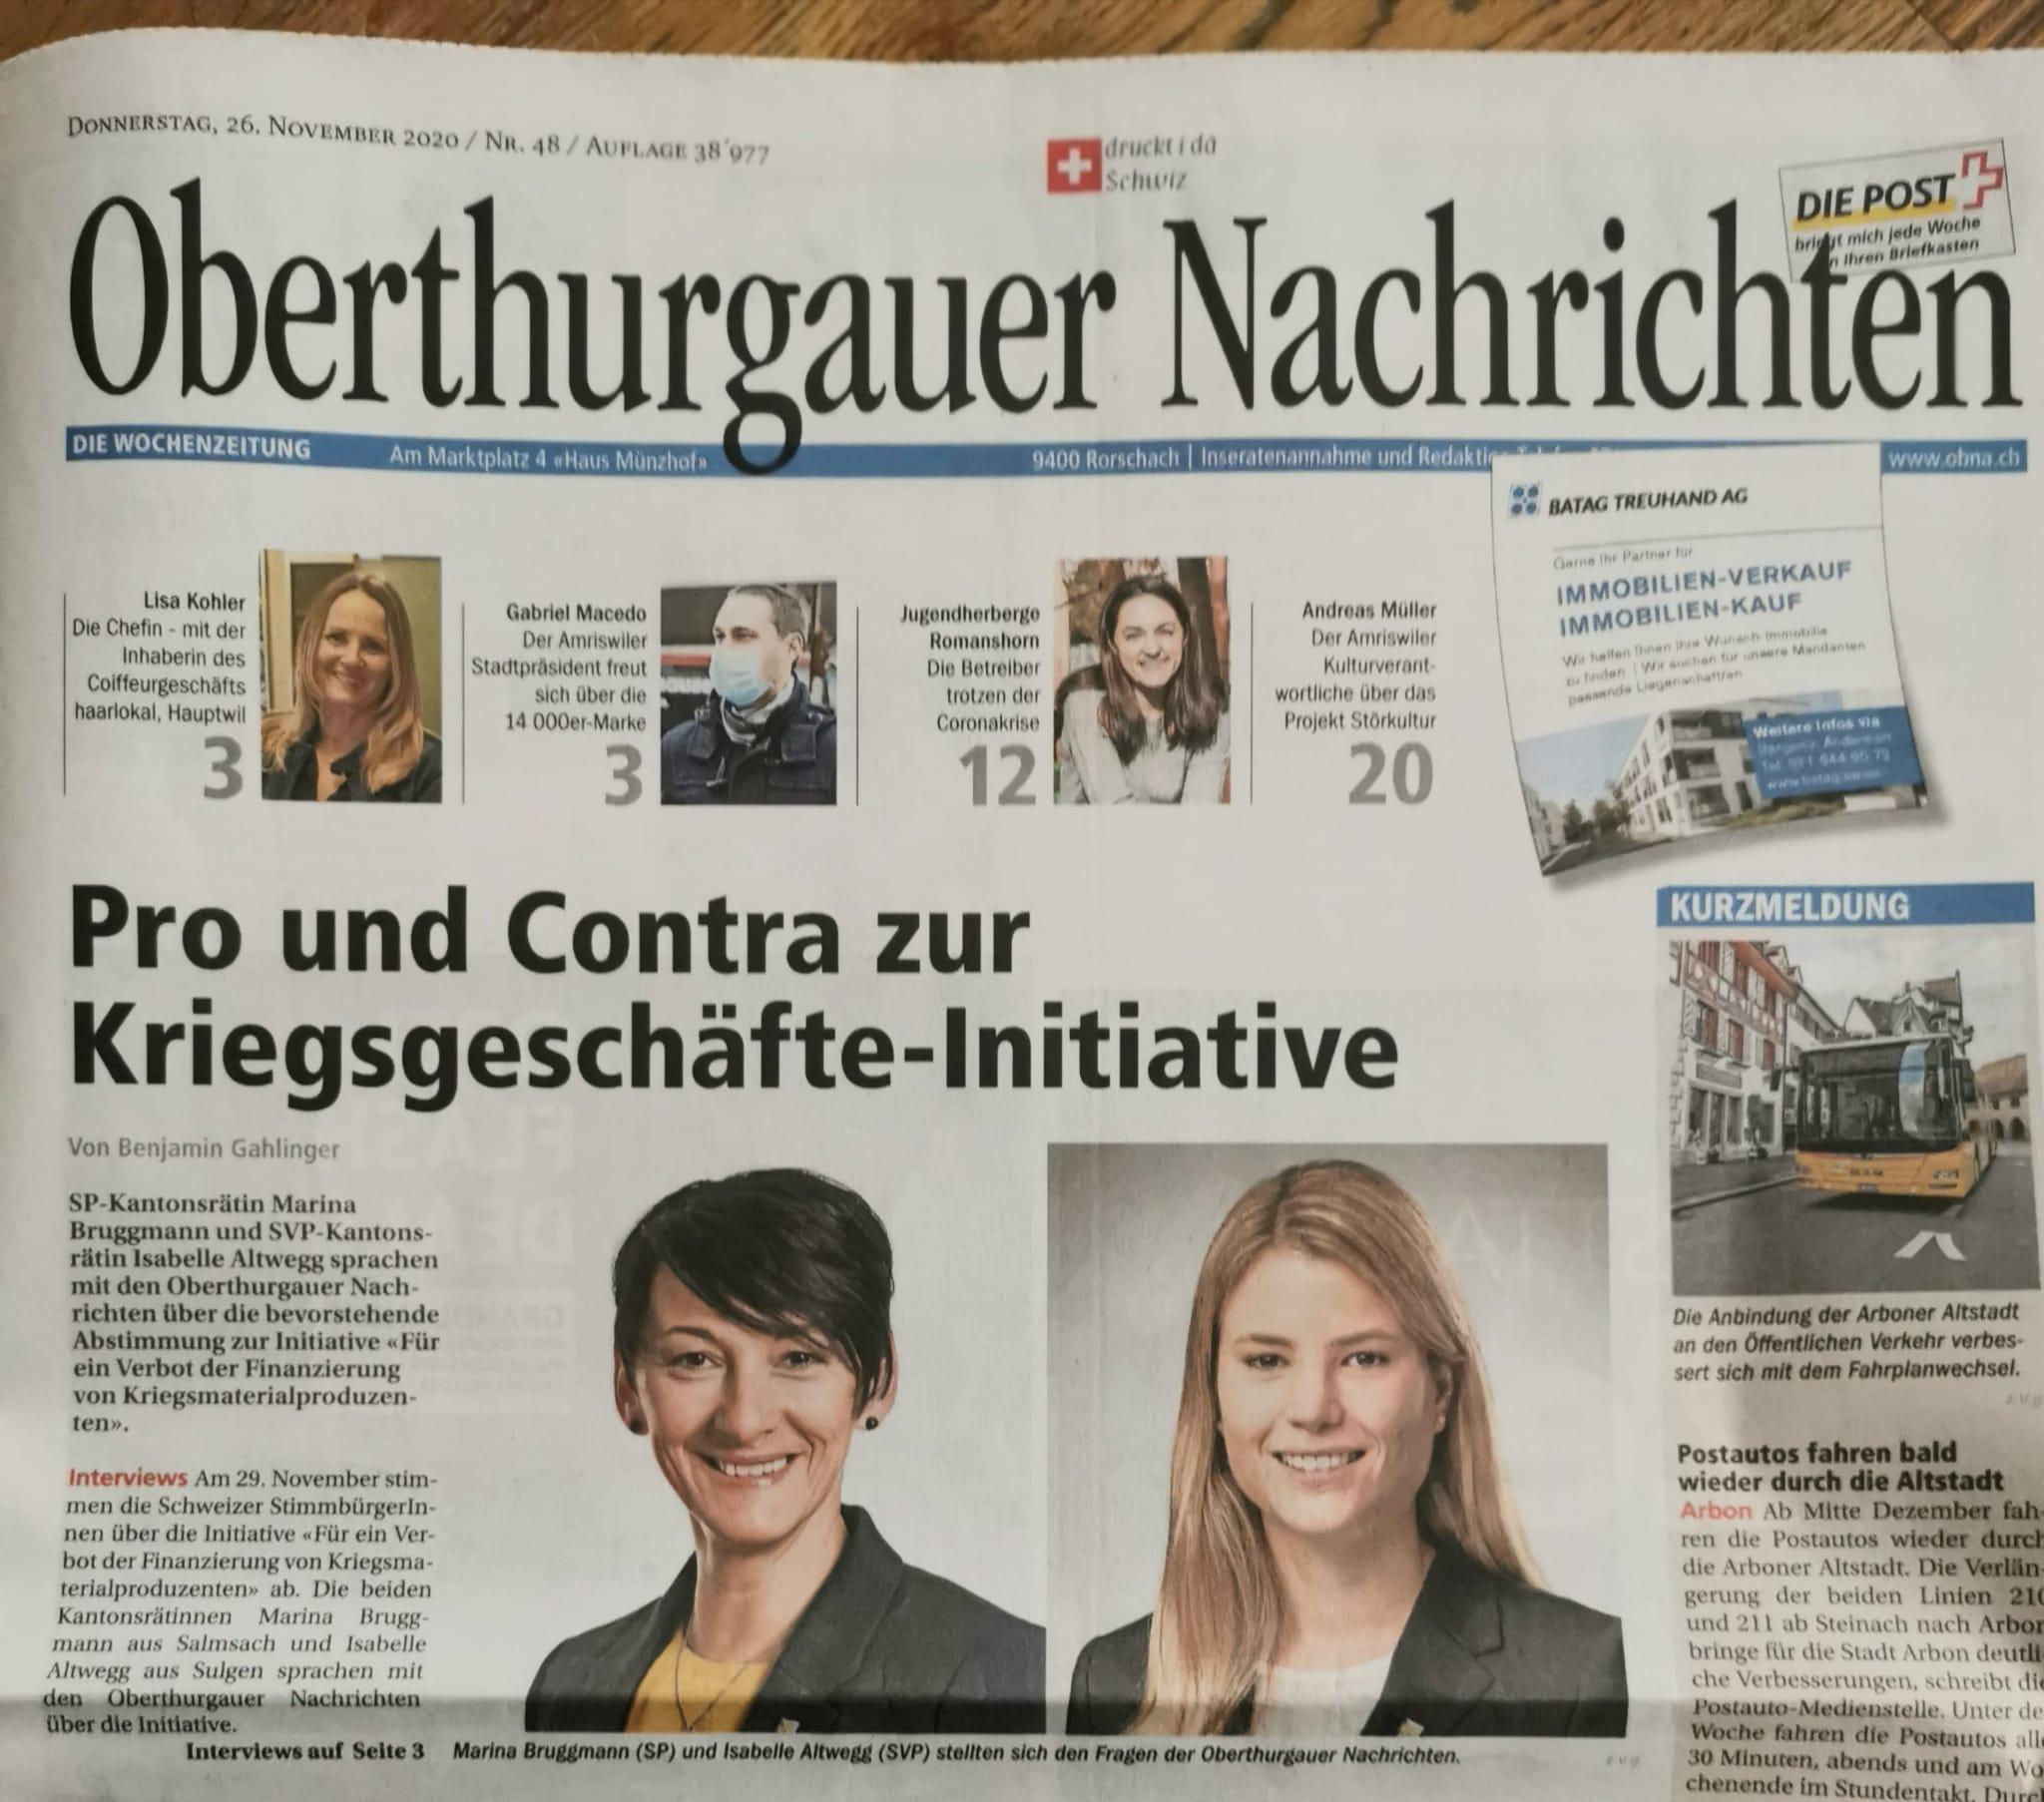 Kriegsgeschäftsinitiative - Abstimmung 11.2020 unterwegs in Romanshorn